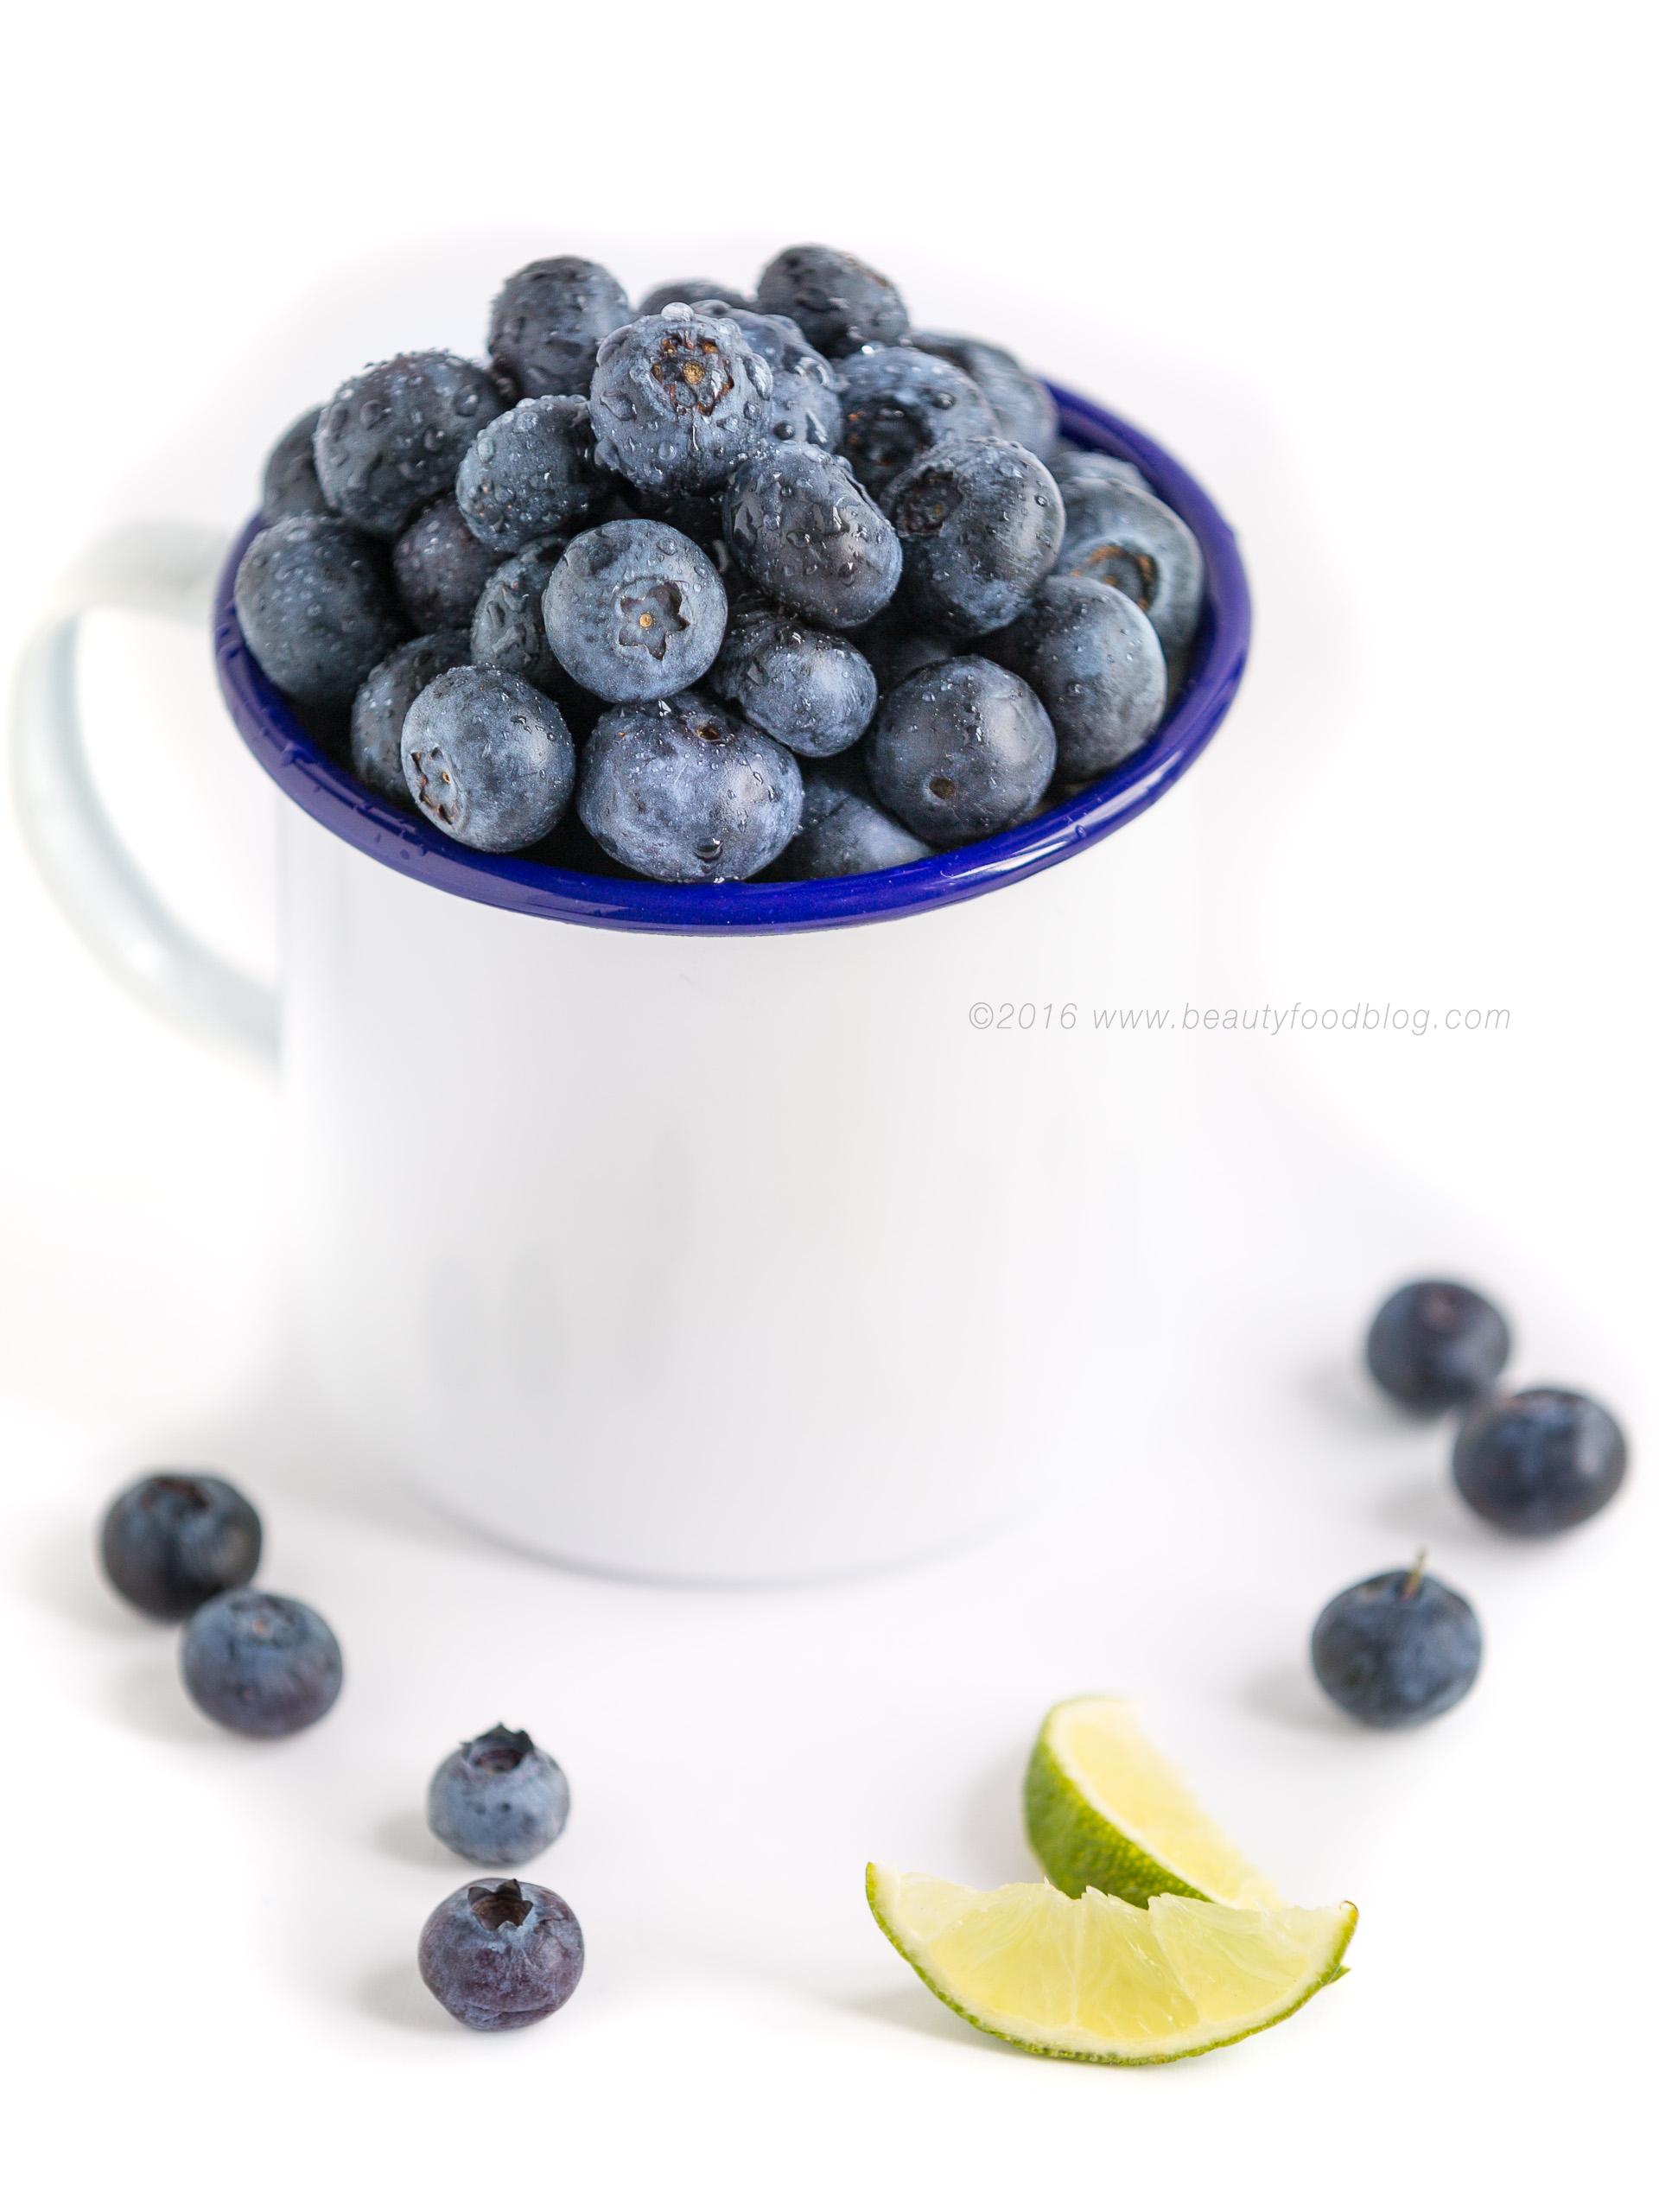 insalata di mirtilli- blueberries spinach hazelnut blueberry salad